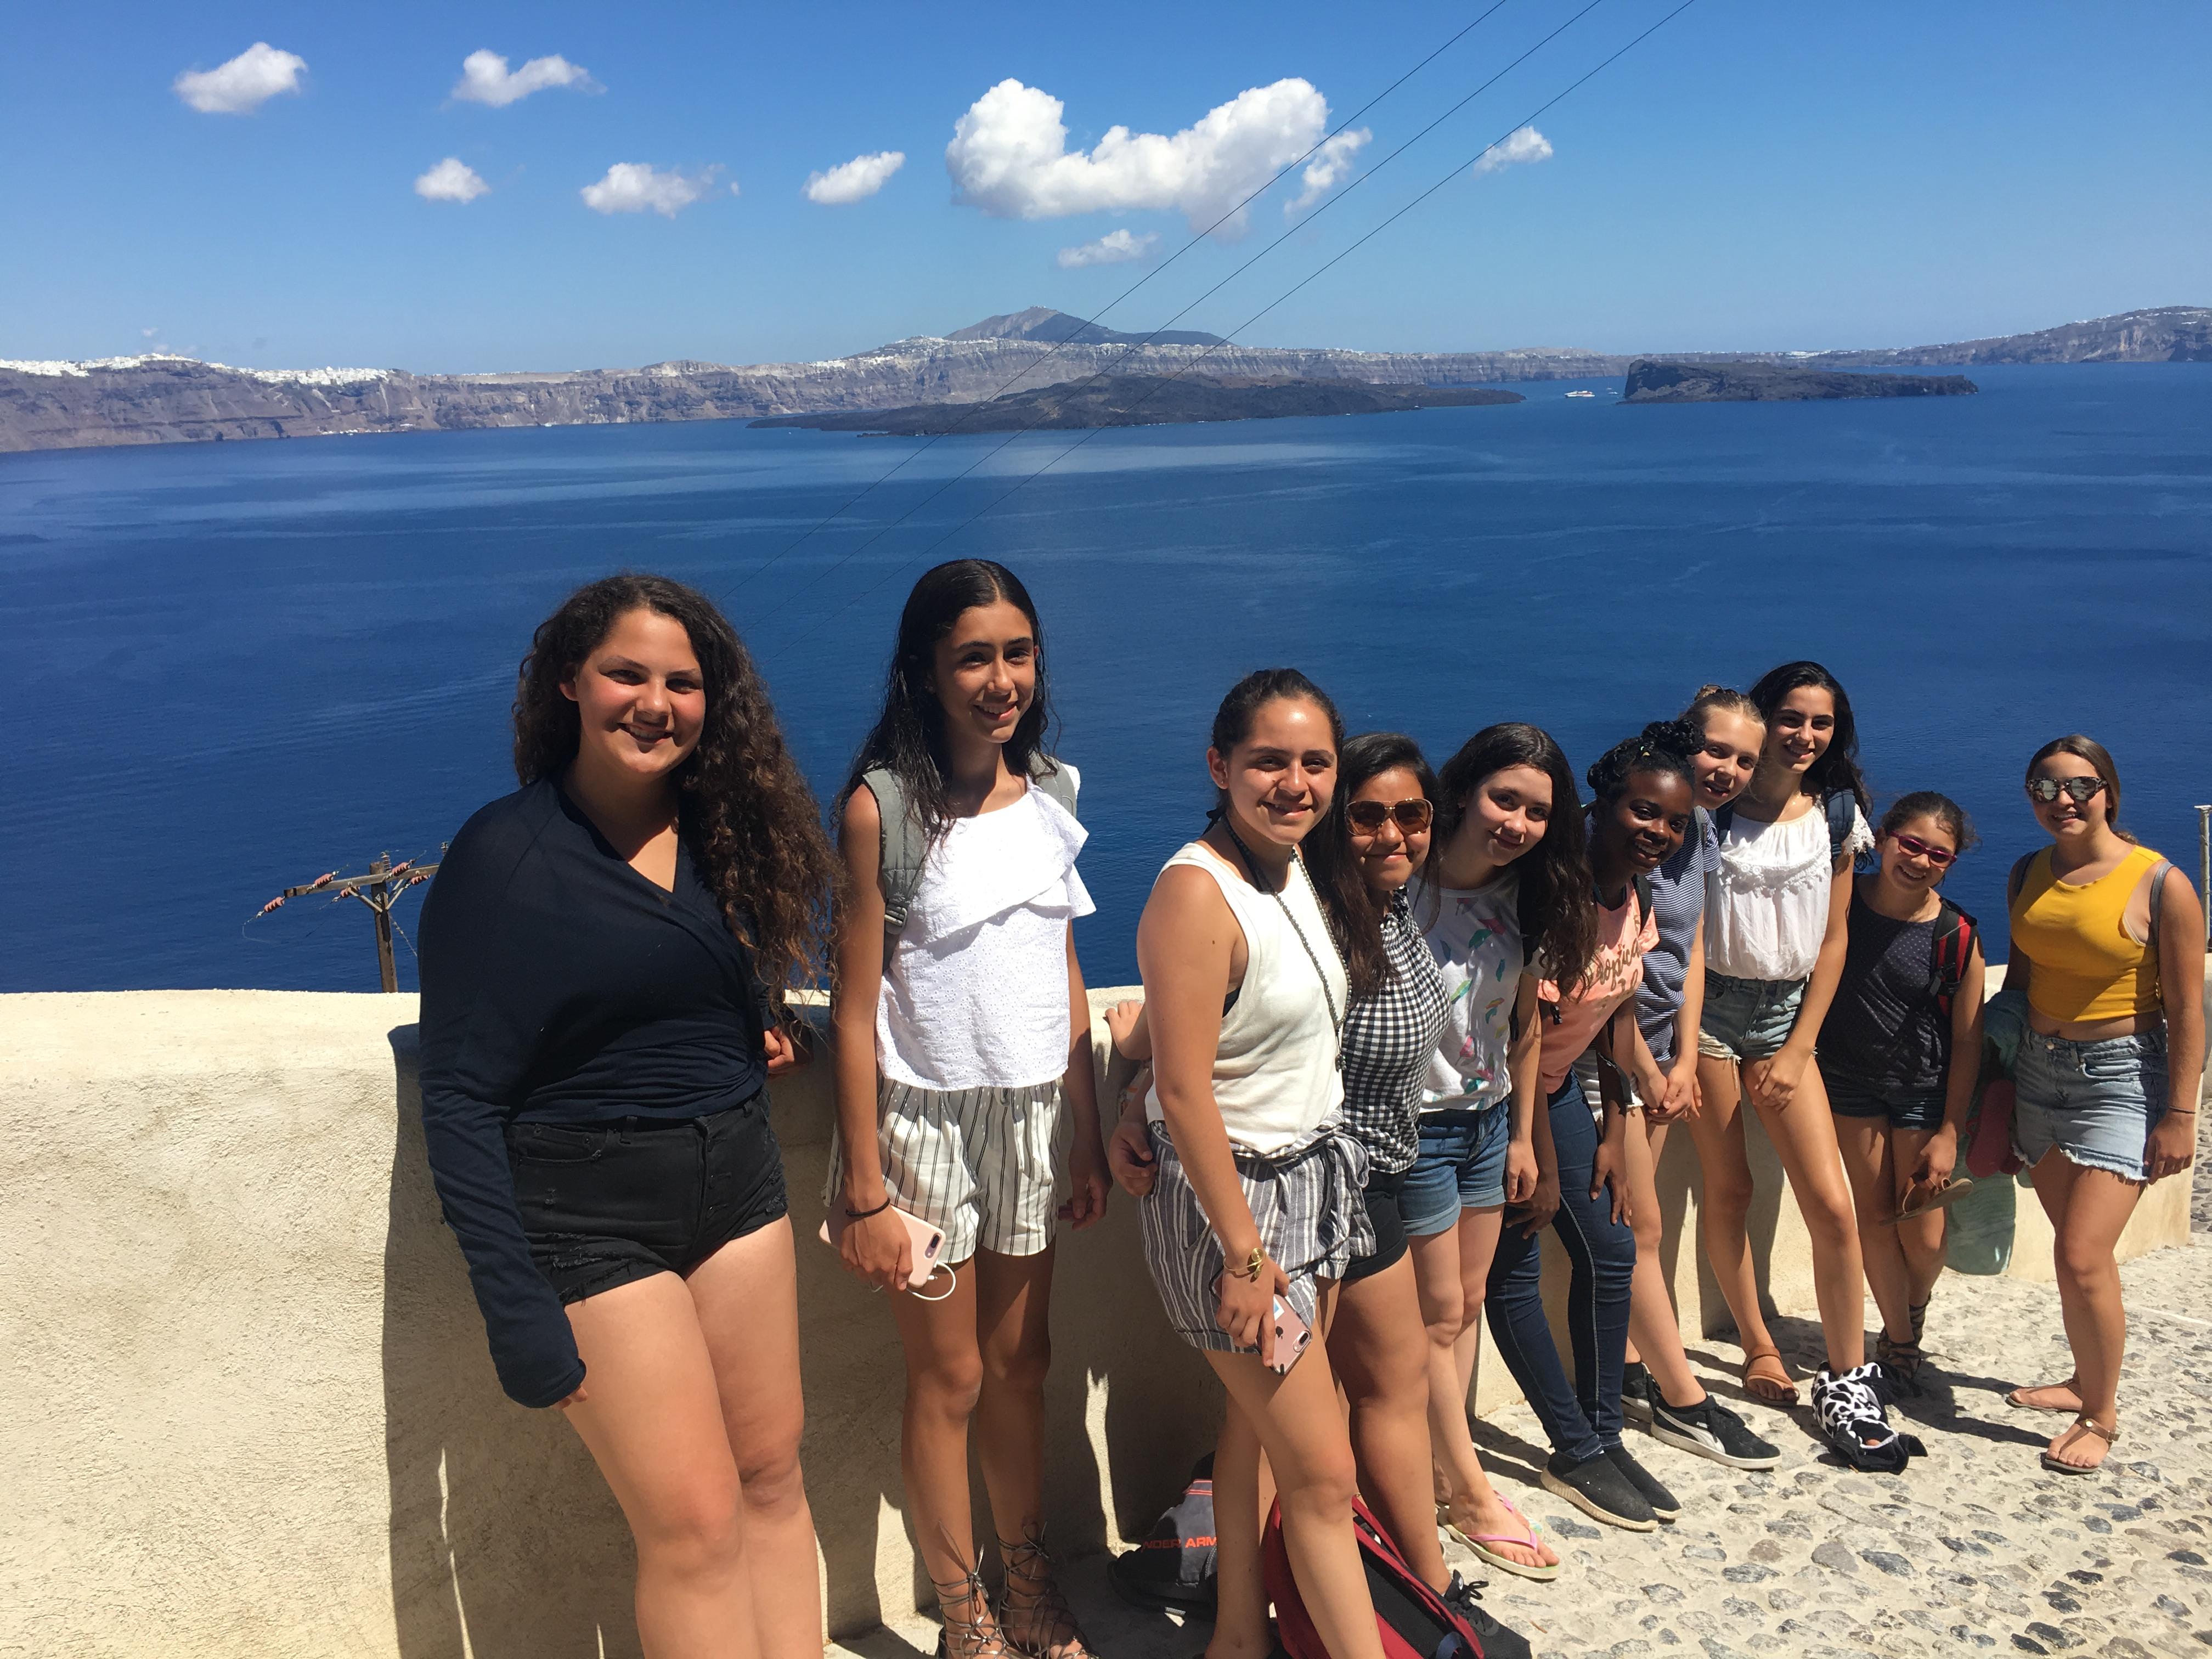 Greece_Youth_Panorama_Islands